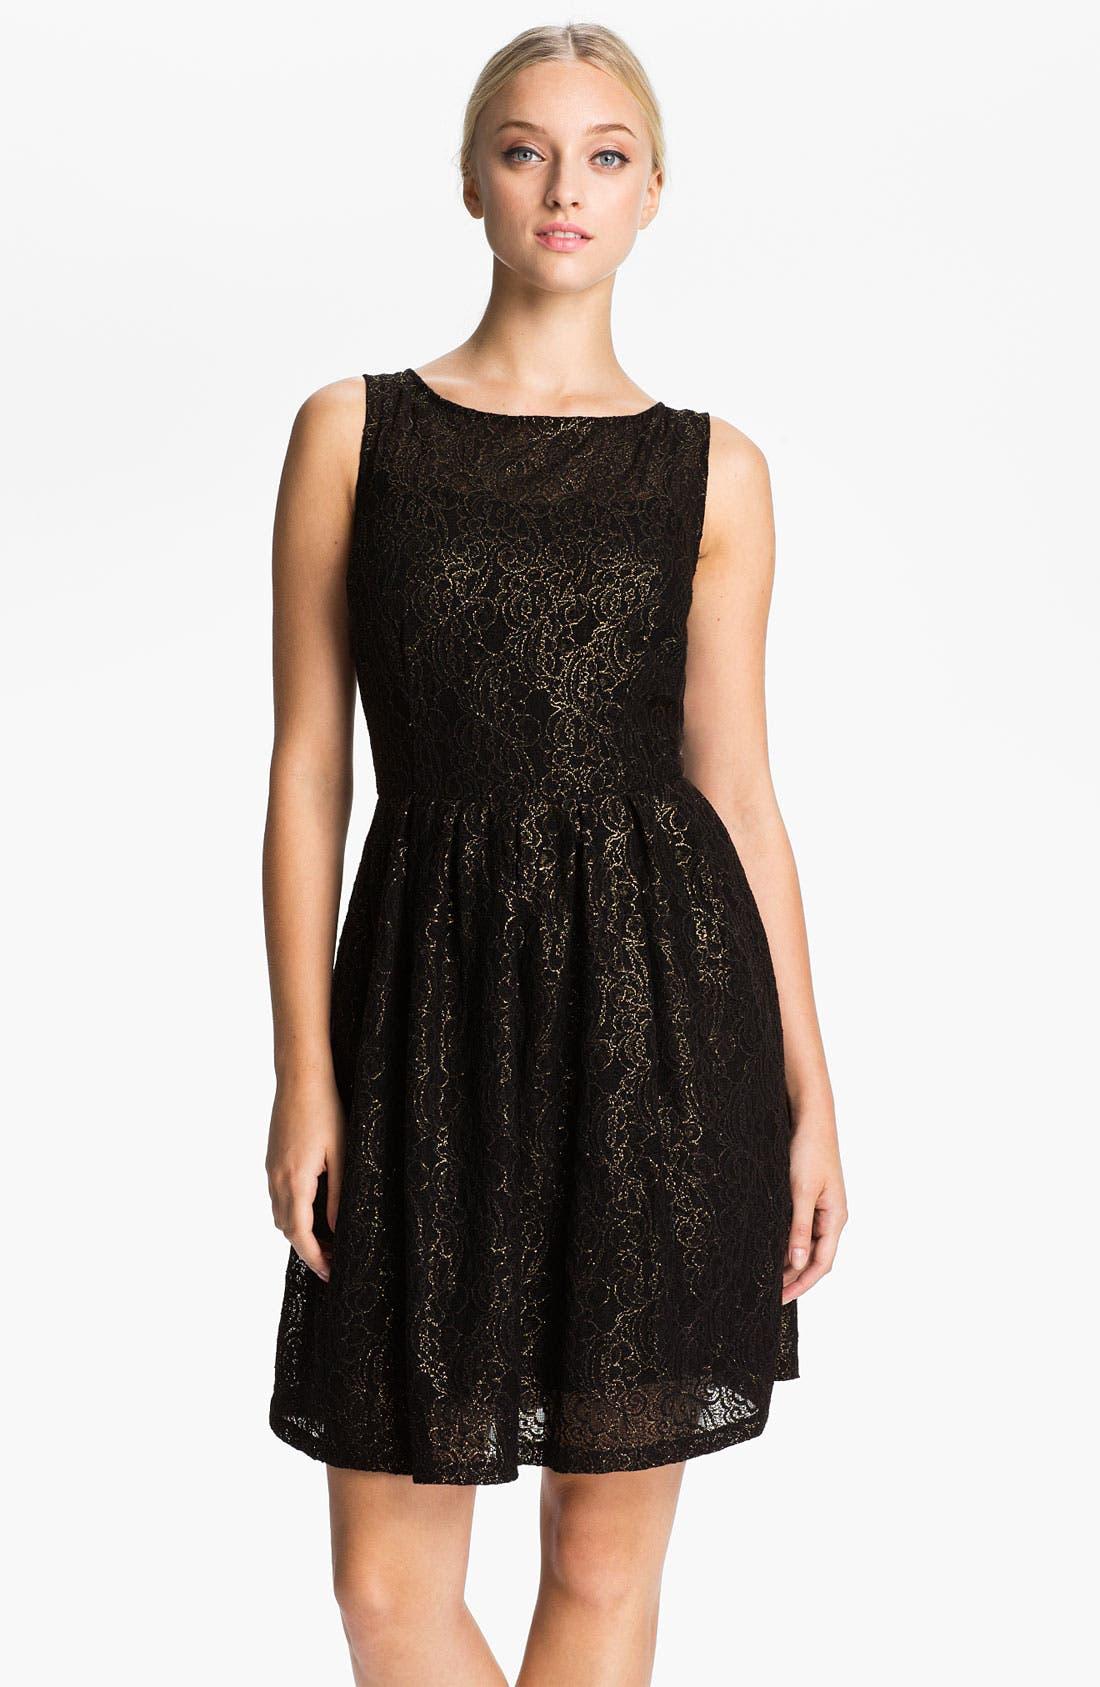 Alternate Image 1 Selected - BB Dakota Metallic Fit & Flare Dress